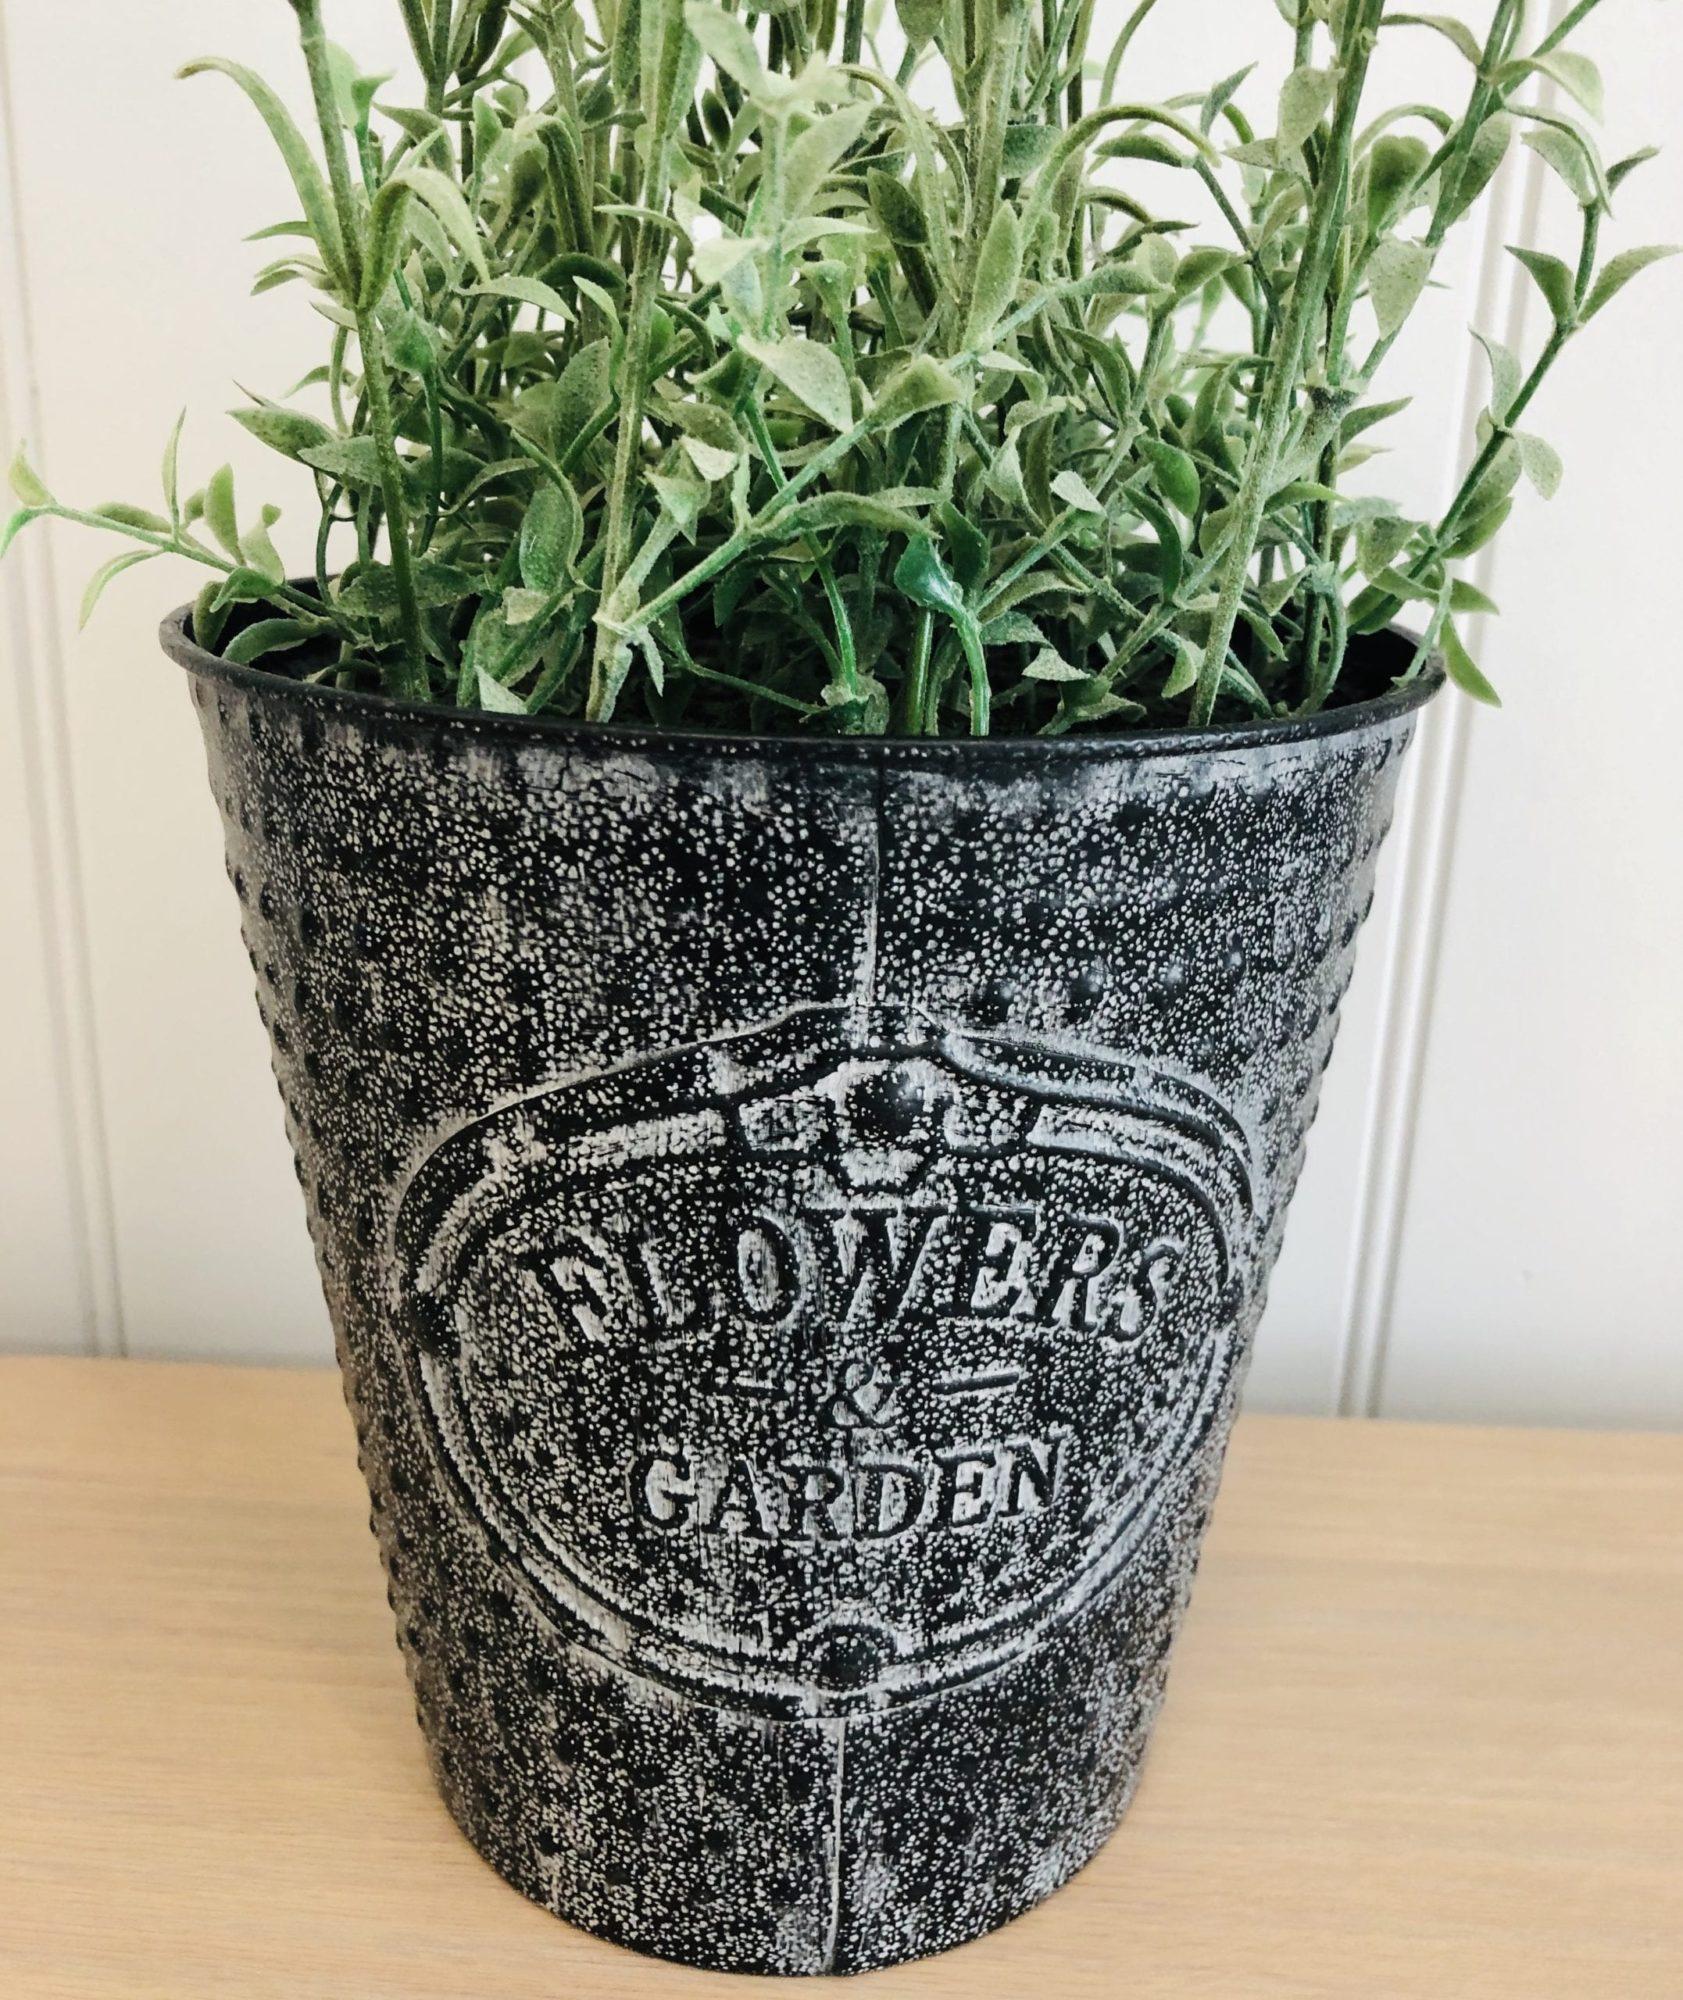 Lavender pot Flower garden close up